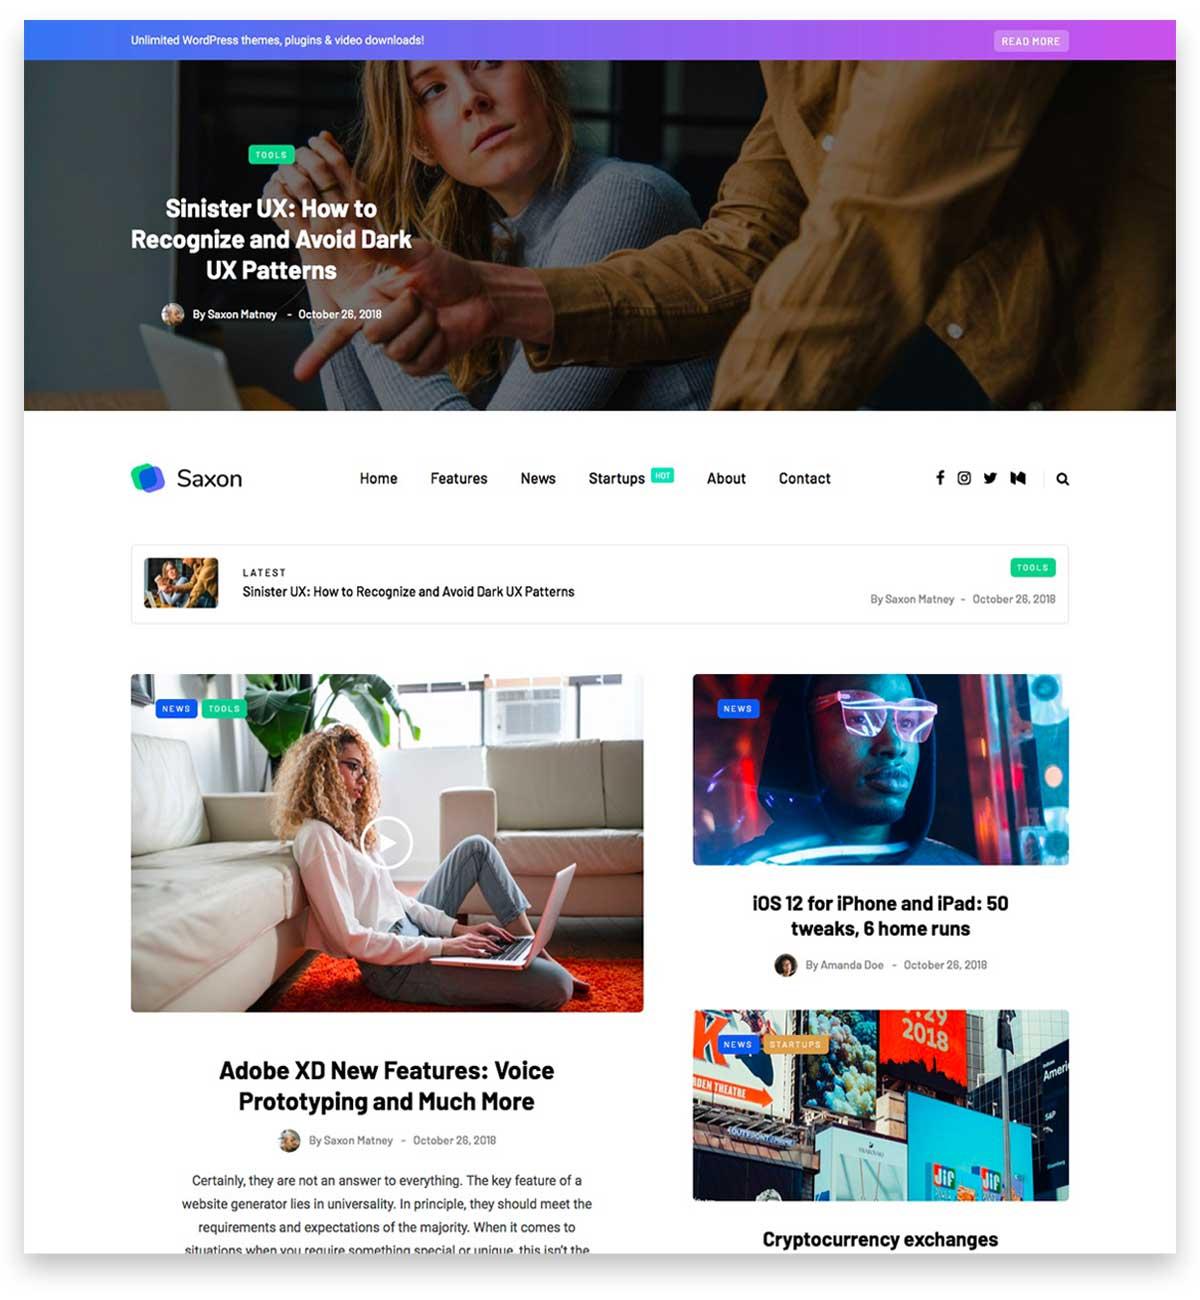 Saxon - Viral Content Blog & Magazine Marketing WordPress Theme